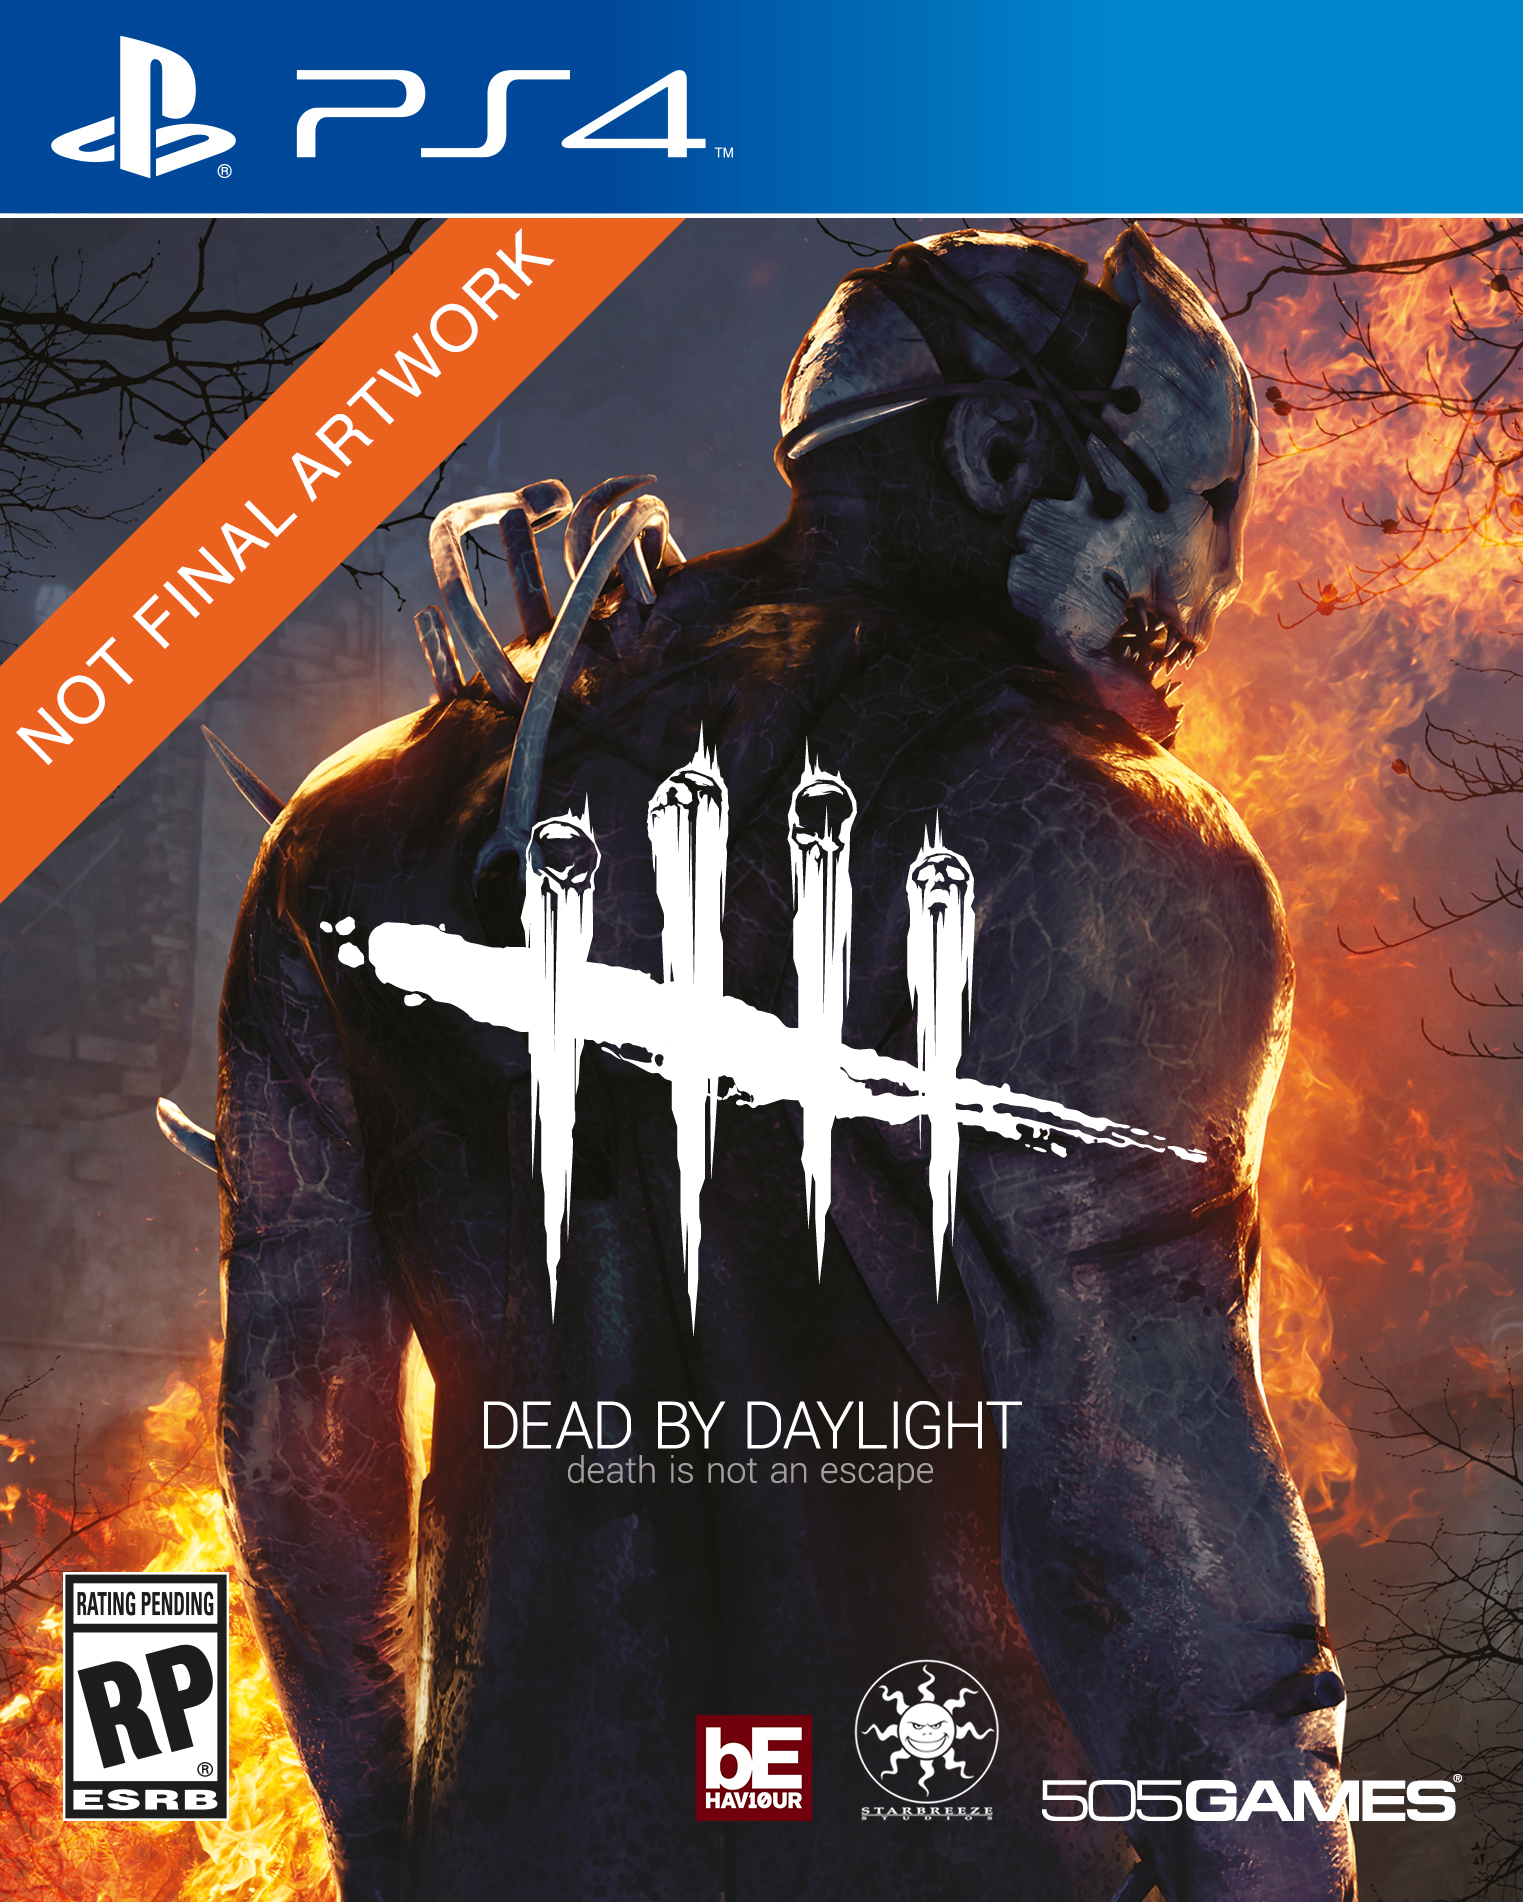 2D PS4 Dead by Daylight ESRB